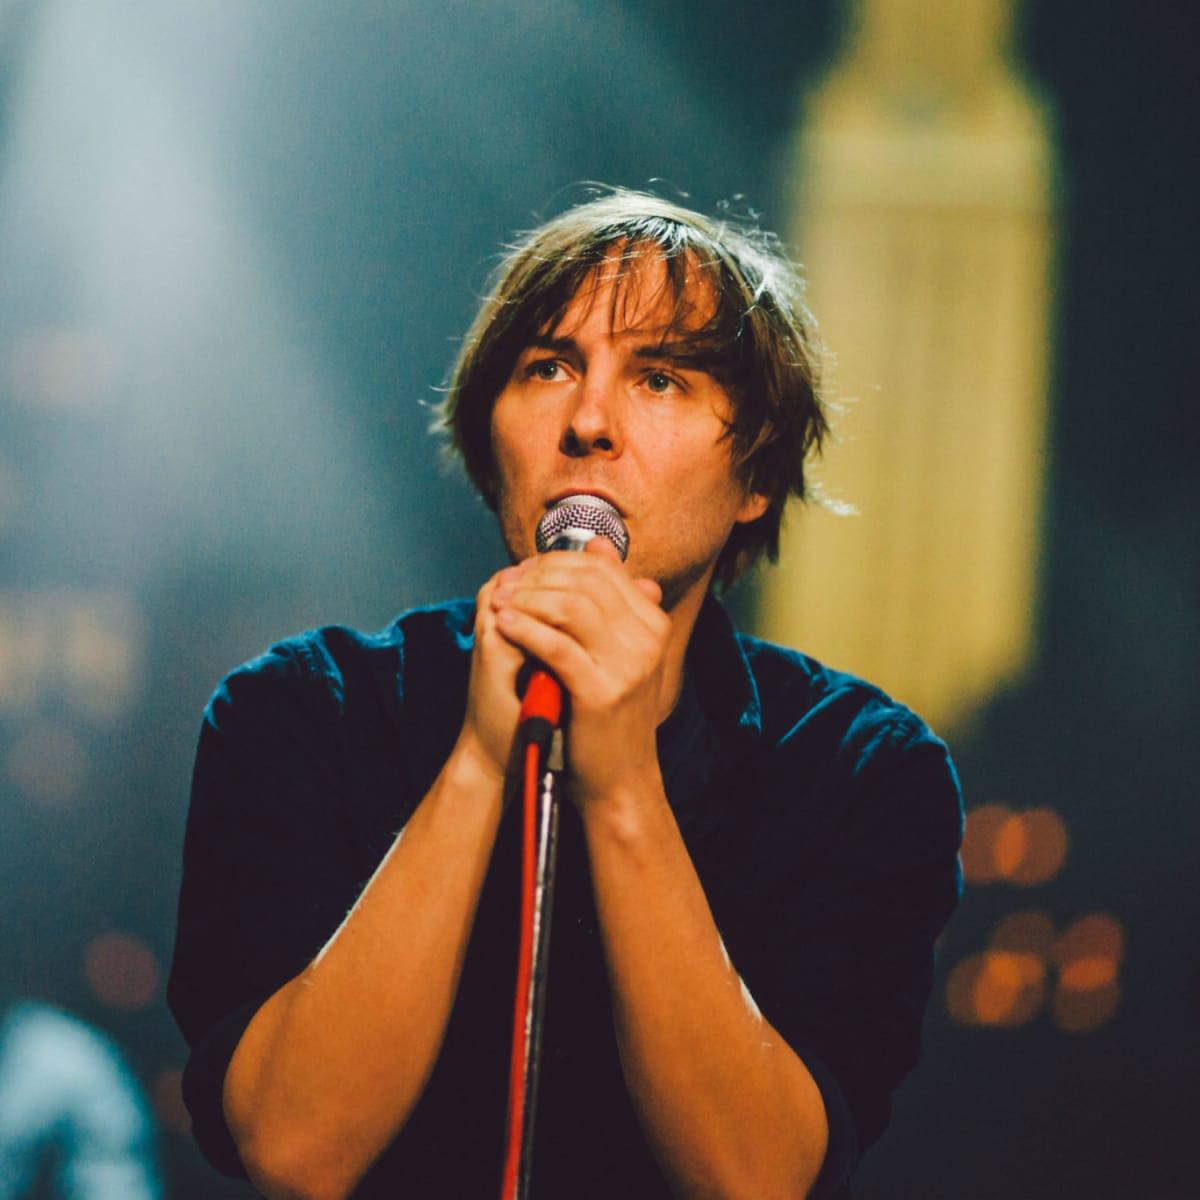 Phoenix singer cropped close